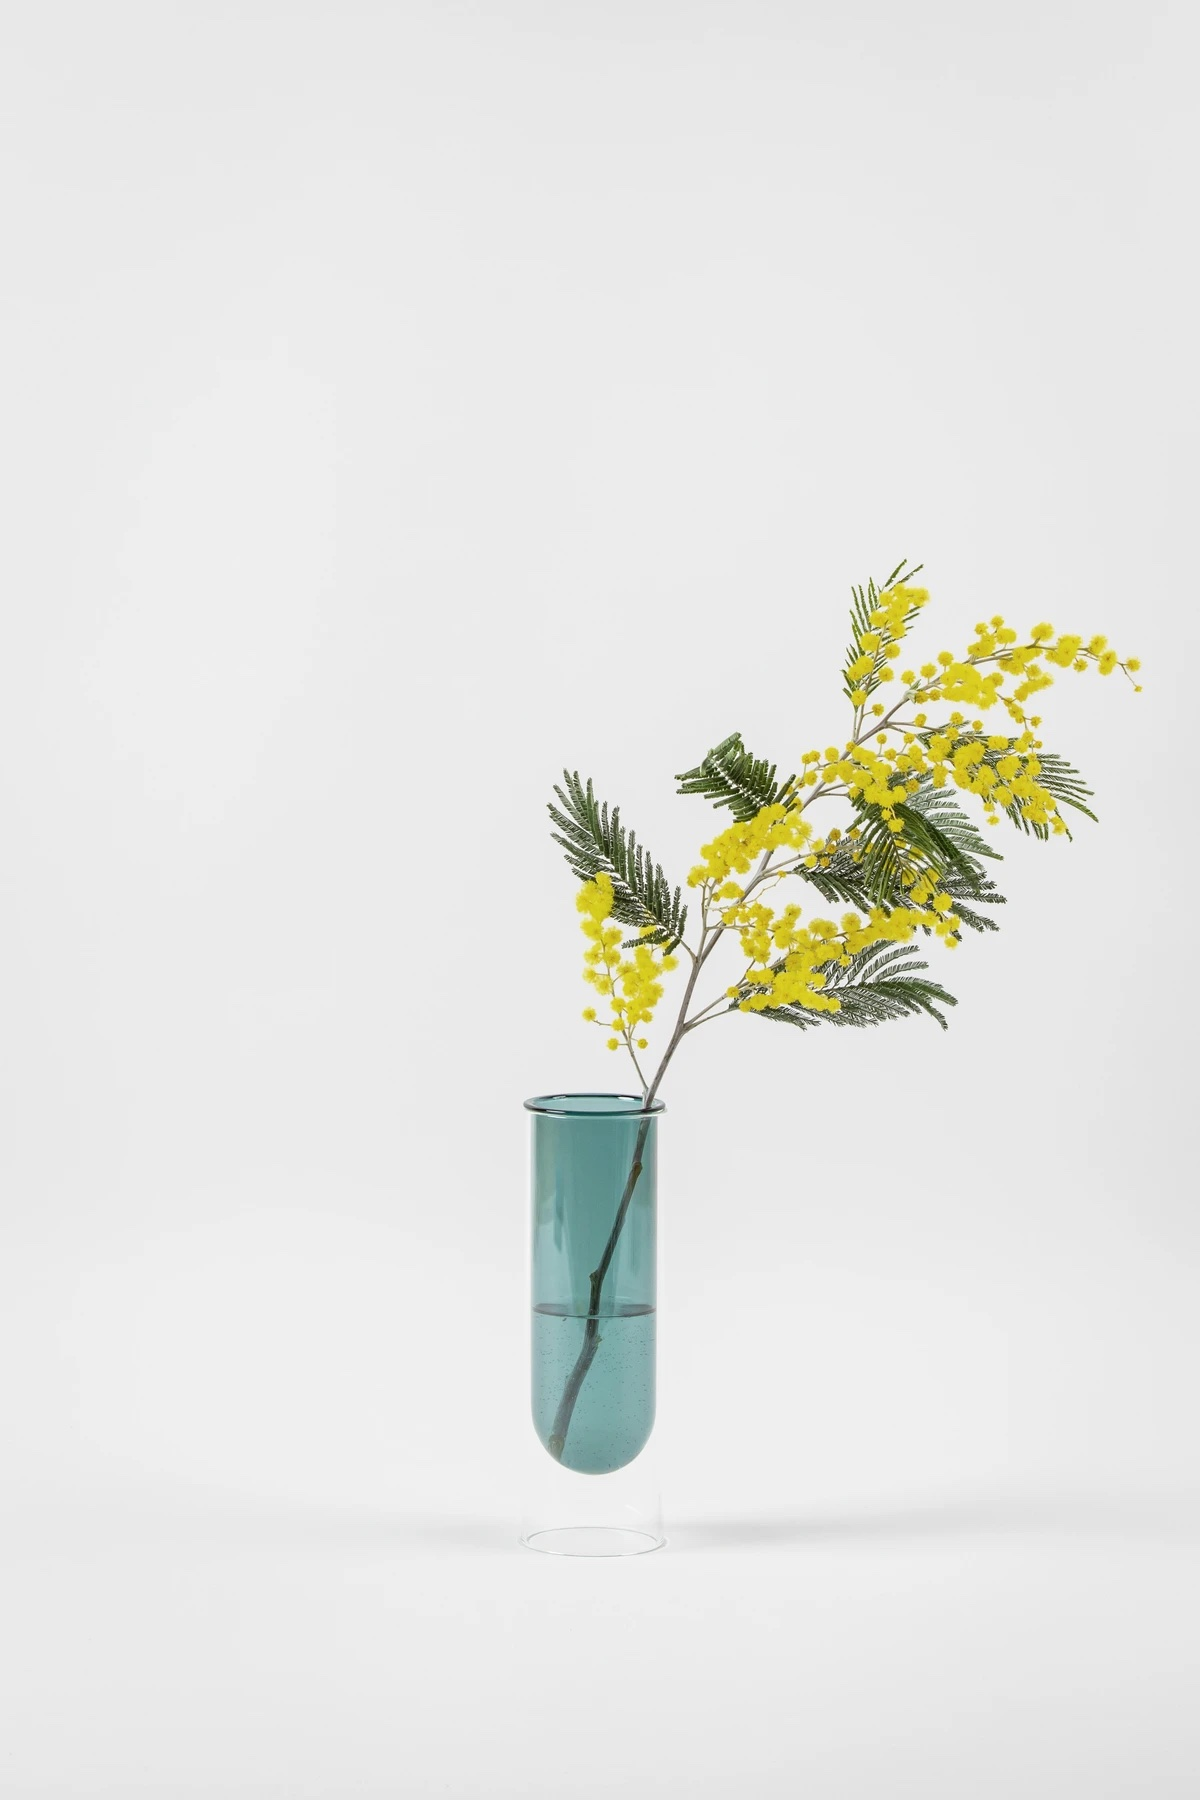 turkis-glasvase-cylinder-flowertube-65200-studioabout